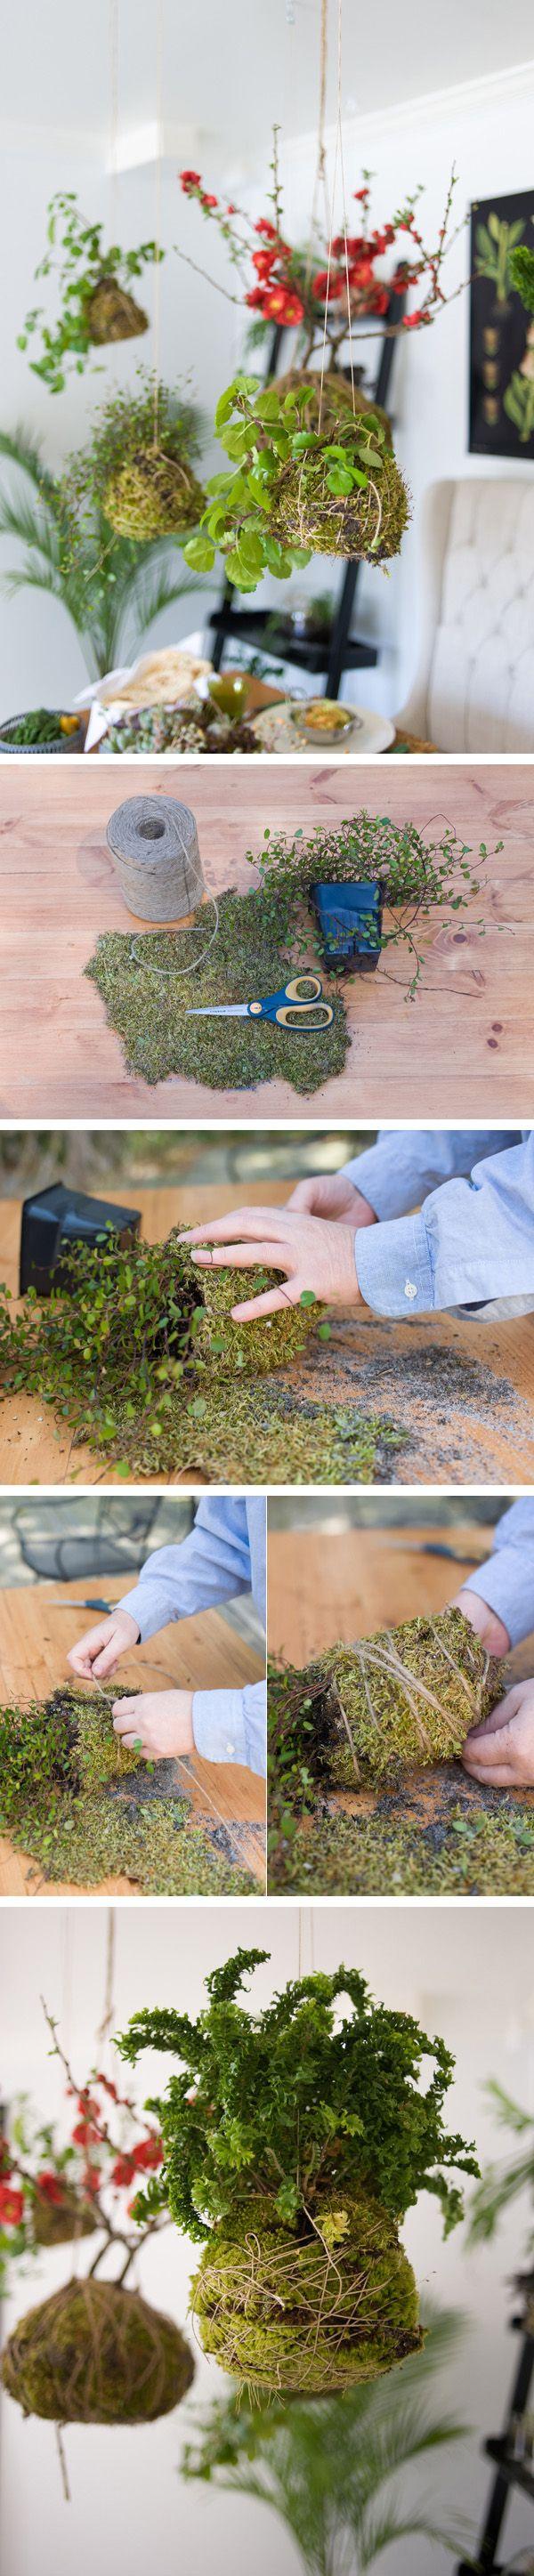 jardin-colgante-kokedama--diy-muy-ingenioso-1